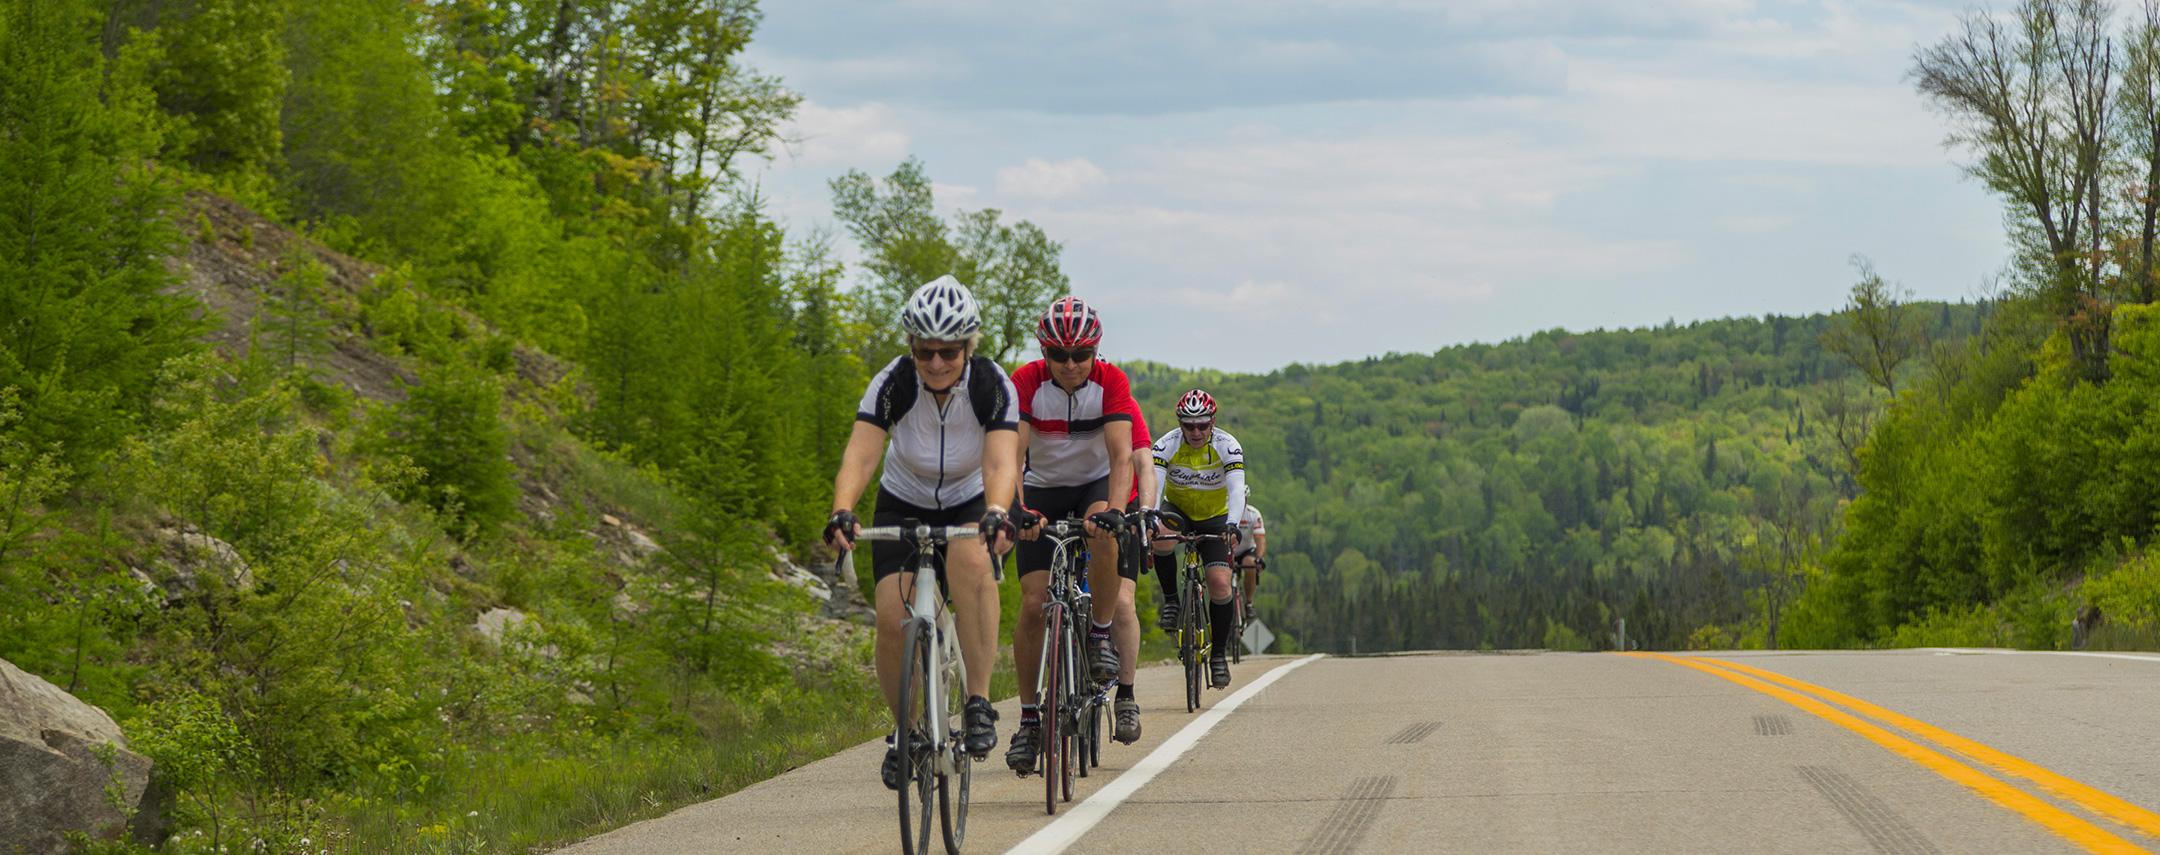 Cycling in Saint-Donat